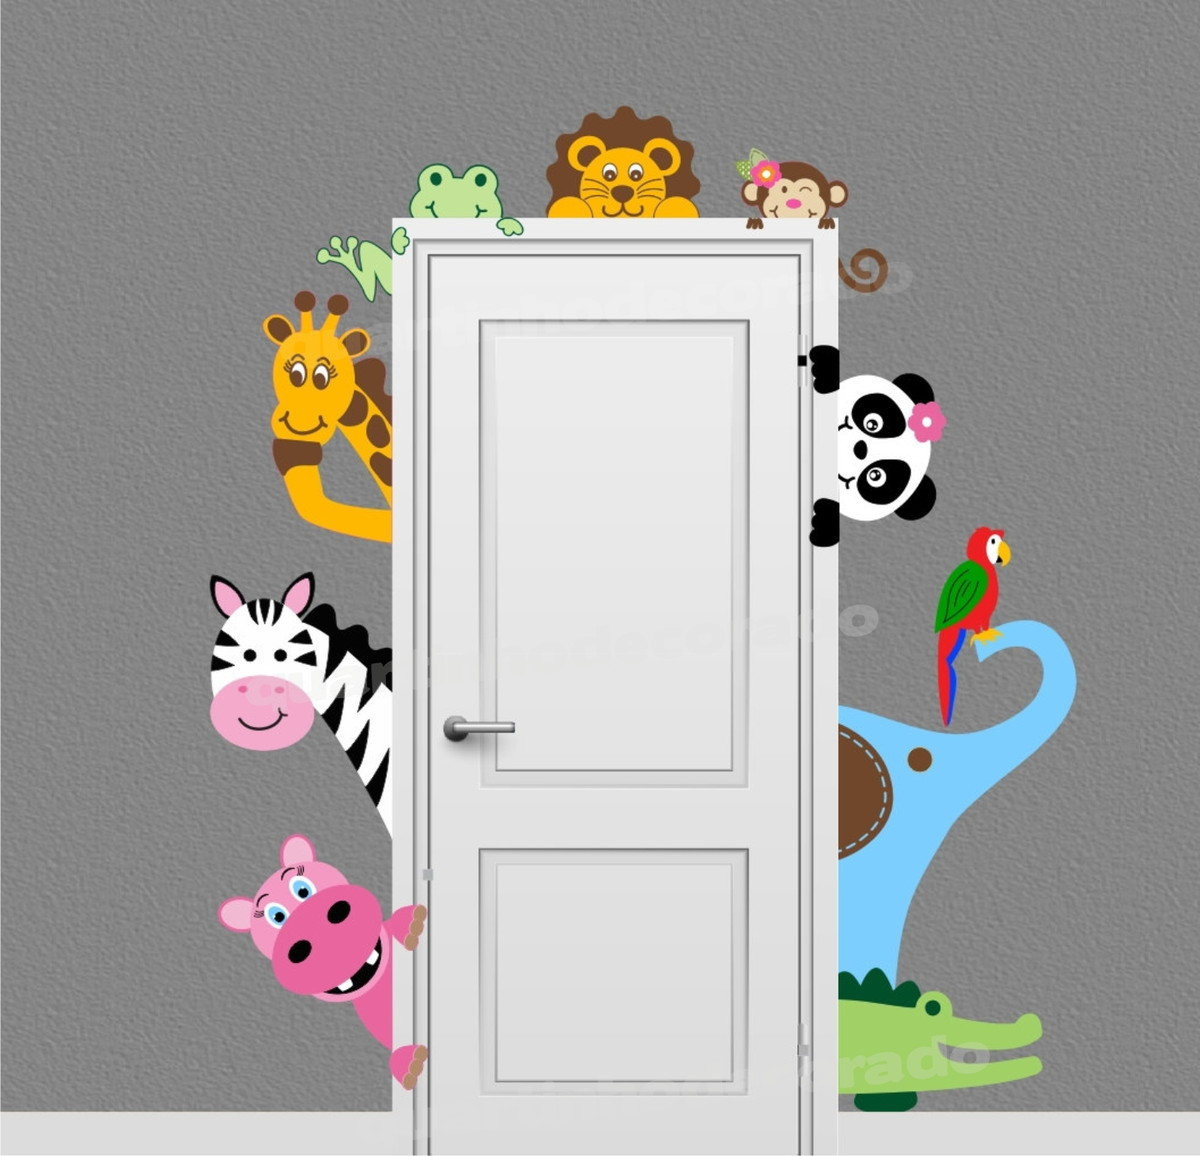 Adesivo Safari Infantil Tam G Mod 64 Quartinhodecorado Elo7 ~ Quarto De Bebê Safari E Quarto De Bebe Criativo